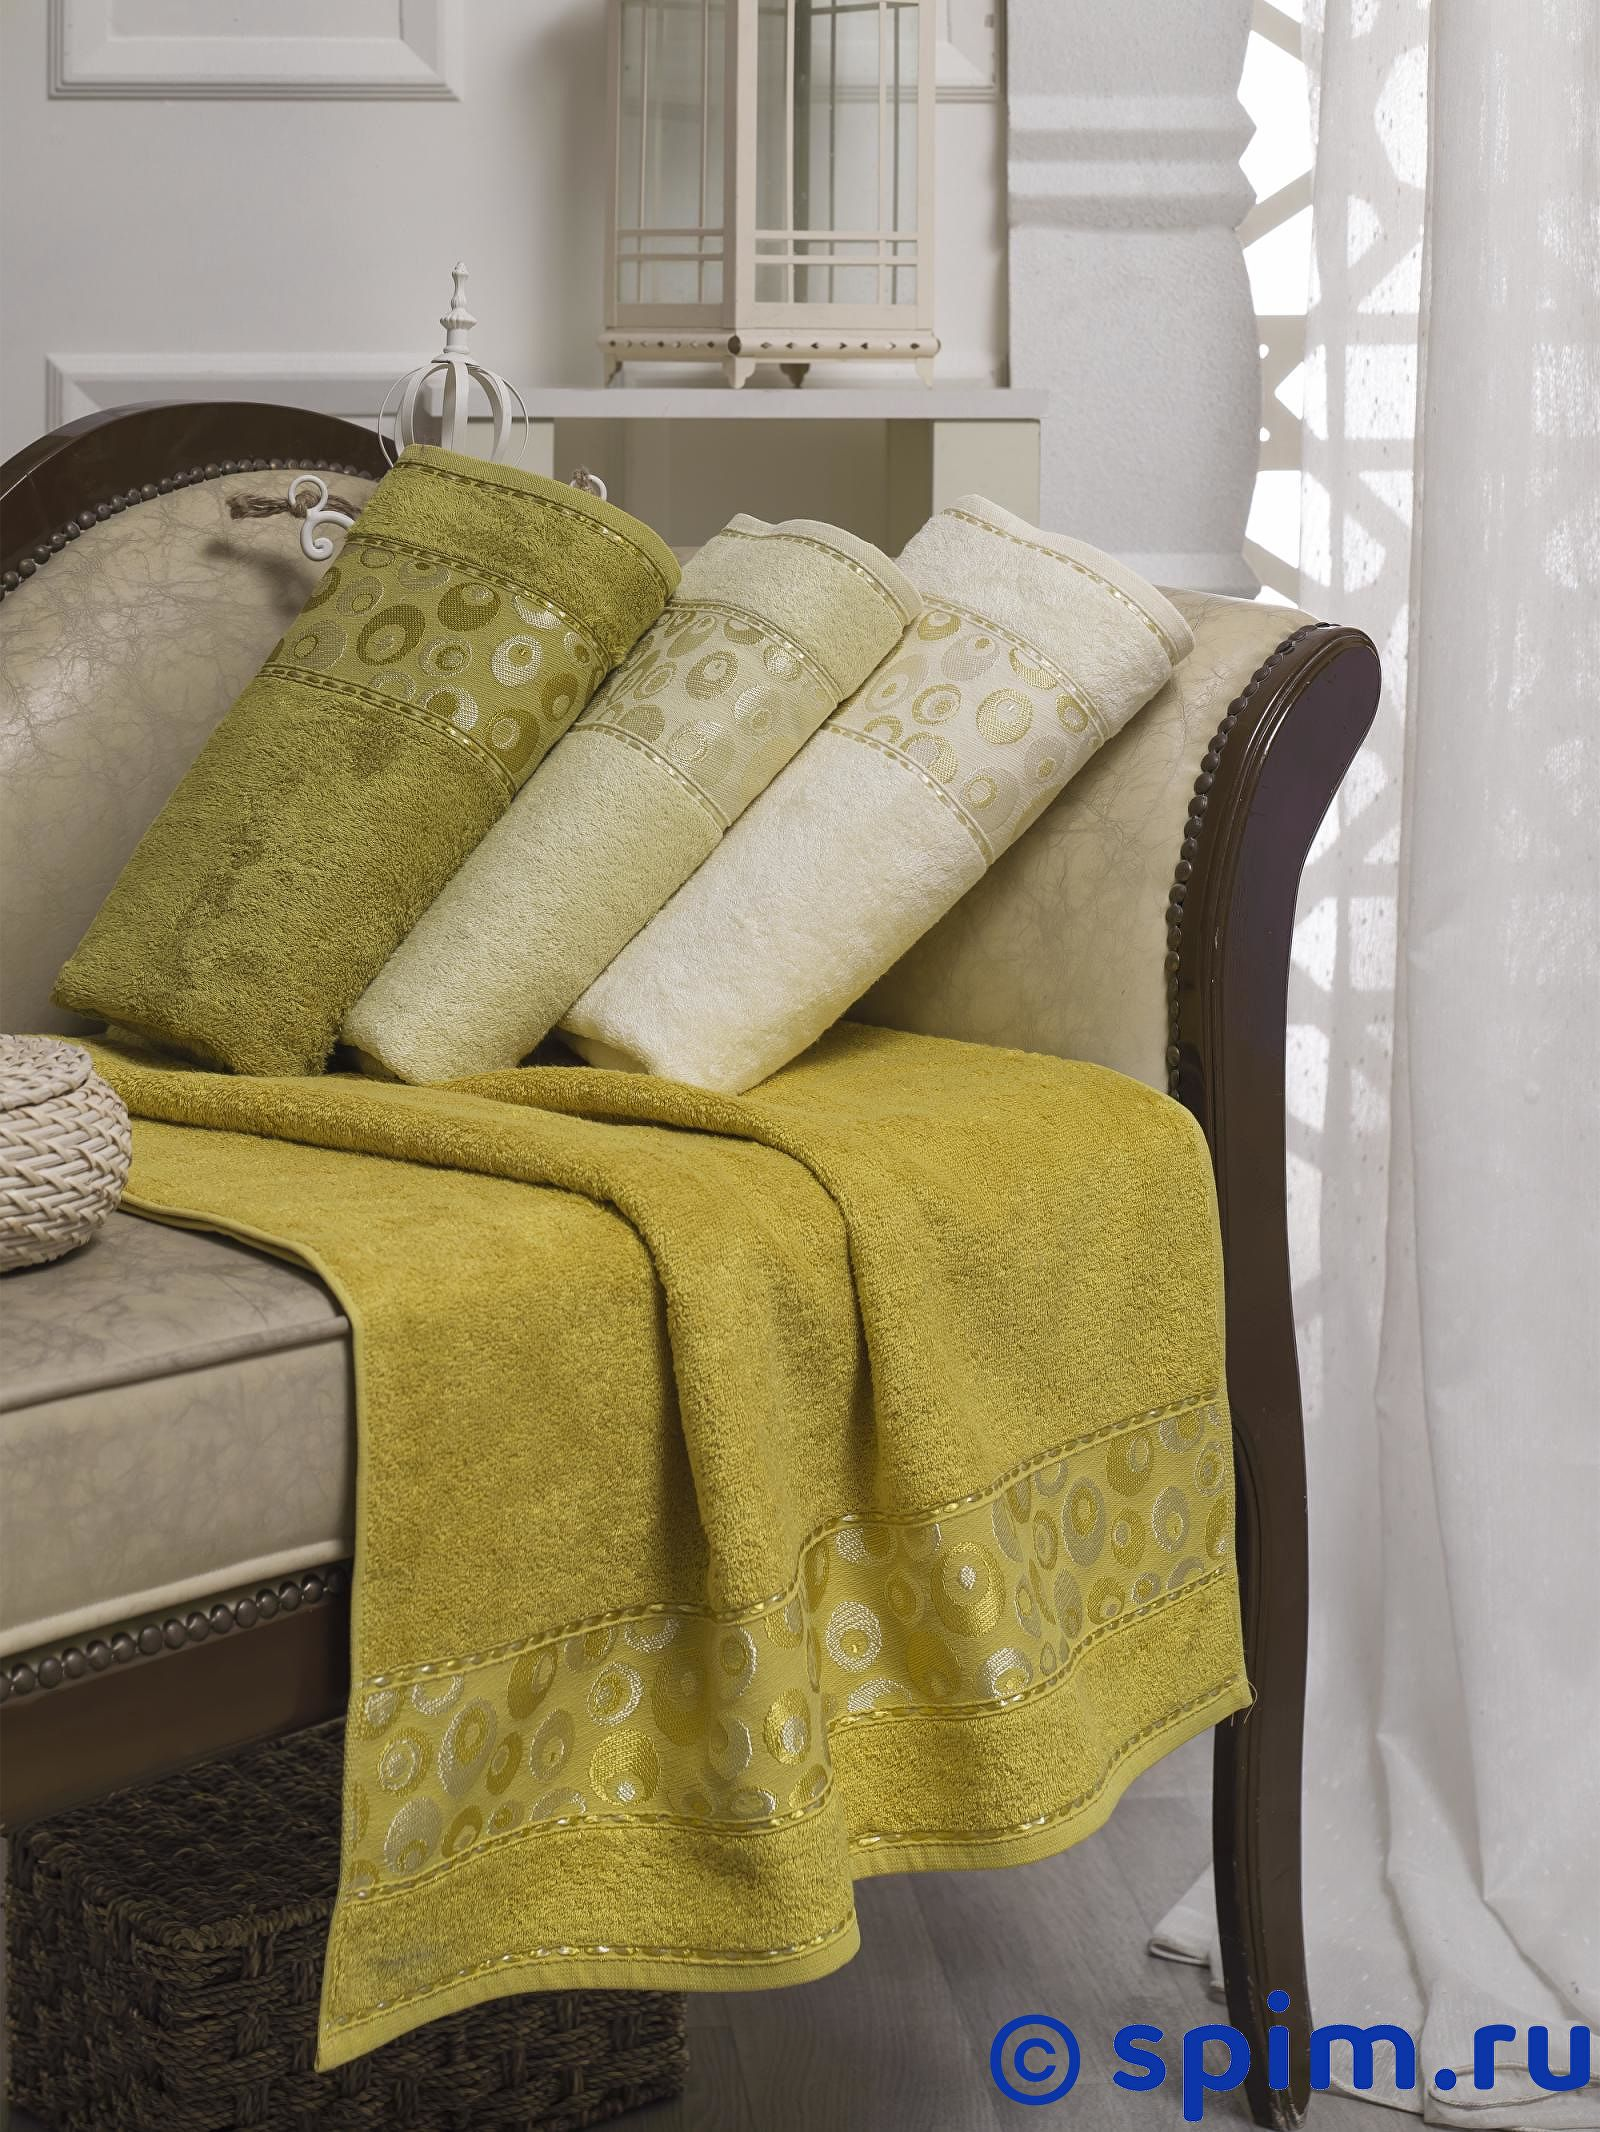 Набор из 4-х полотенец Do&co Elmira 70х140 см полотенца do n co полотенце lady цвет мятный набор